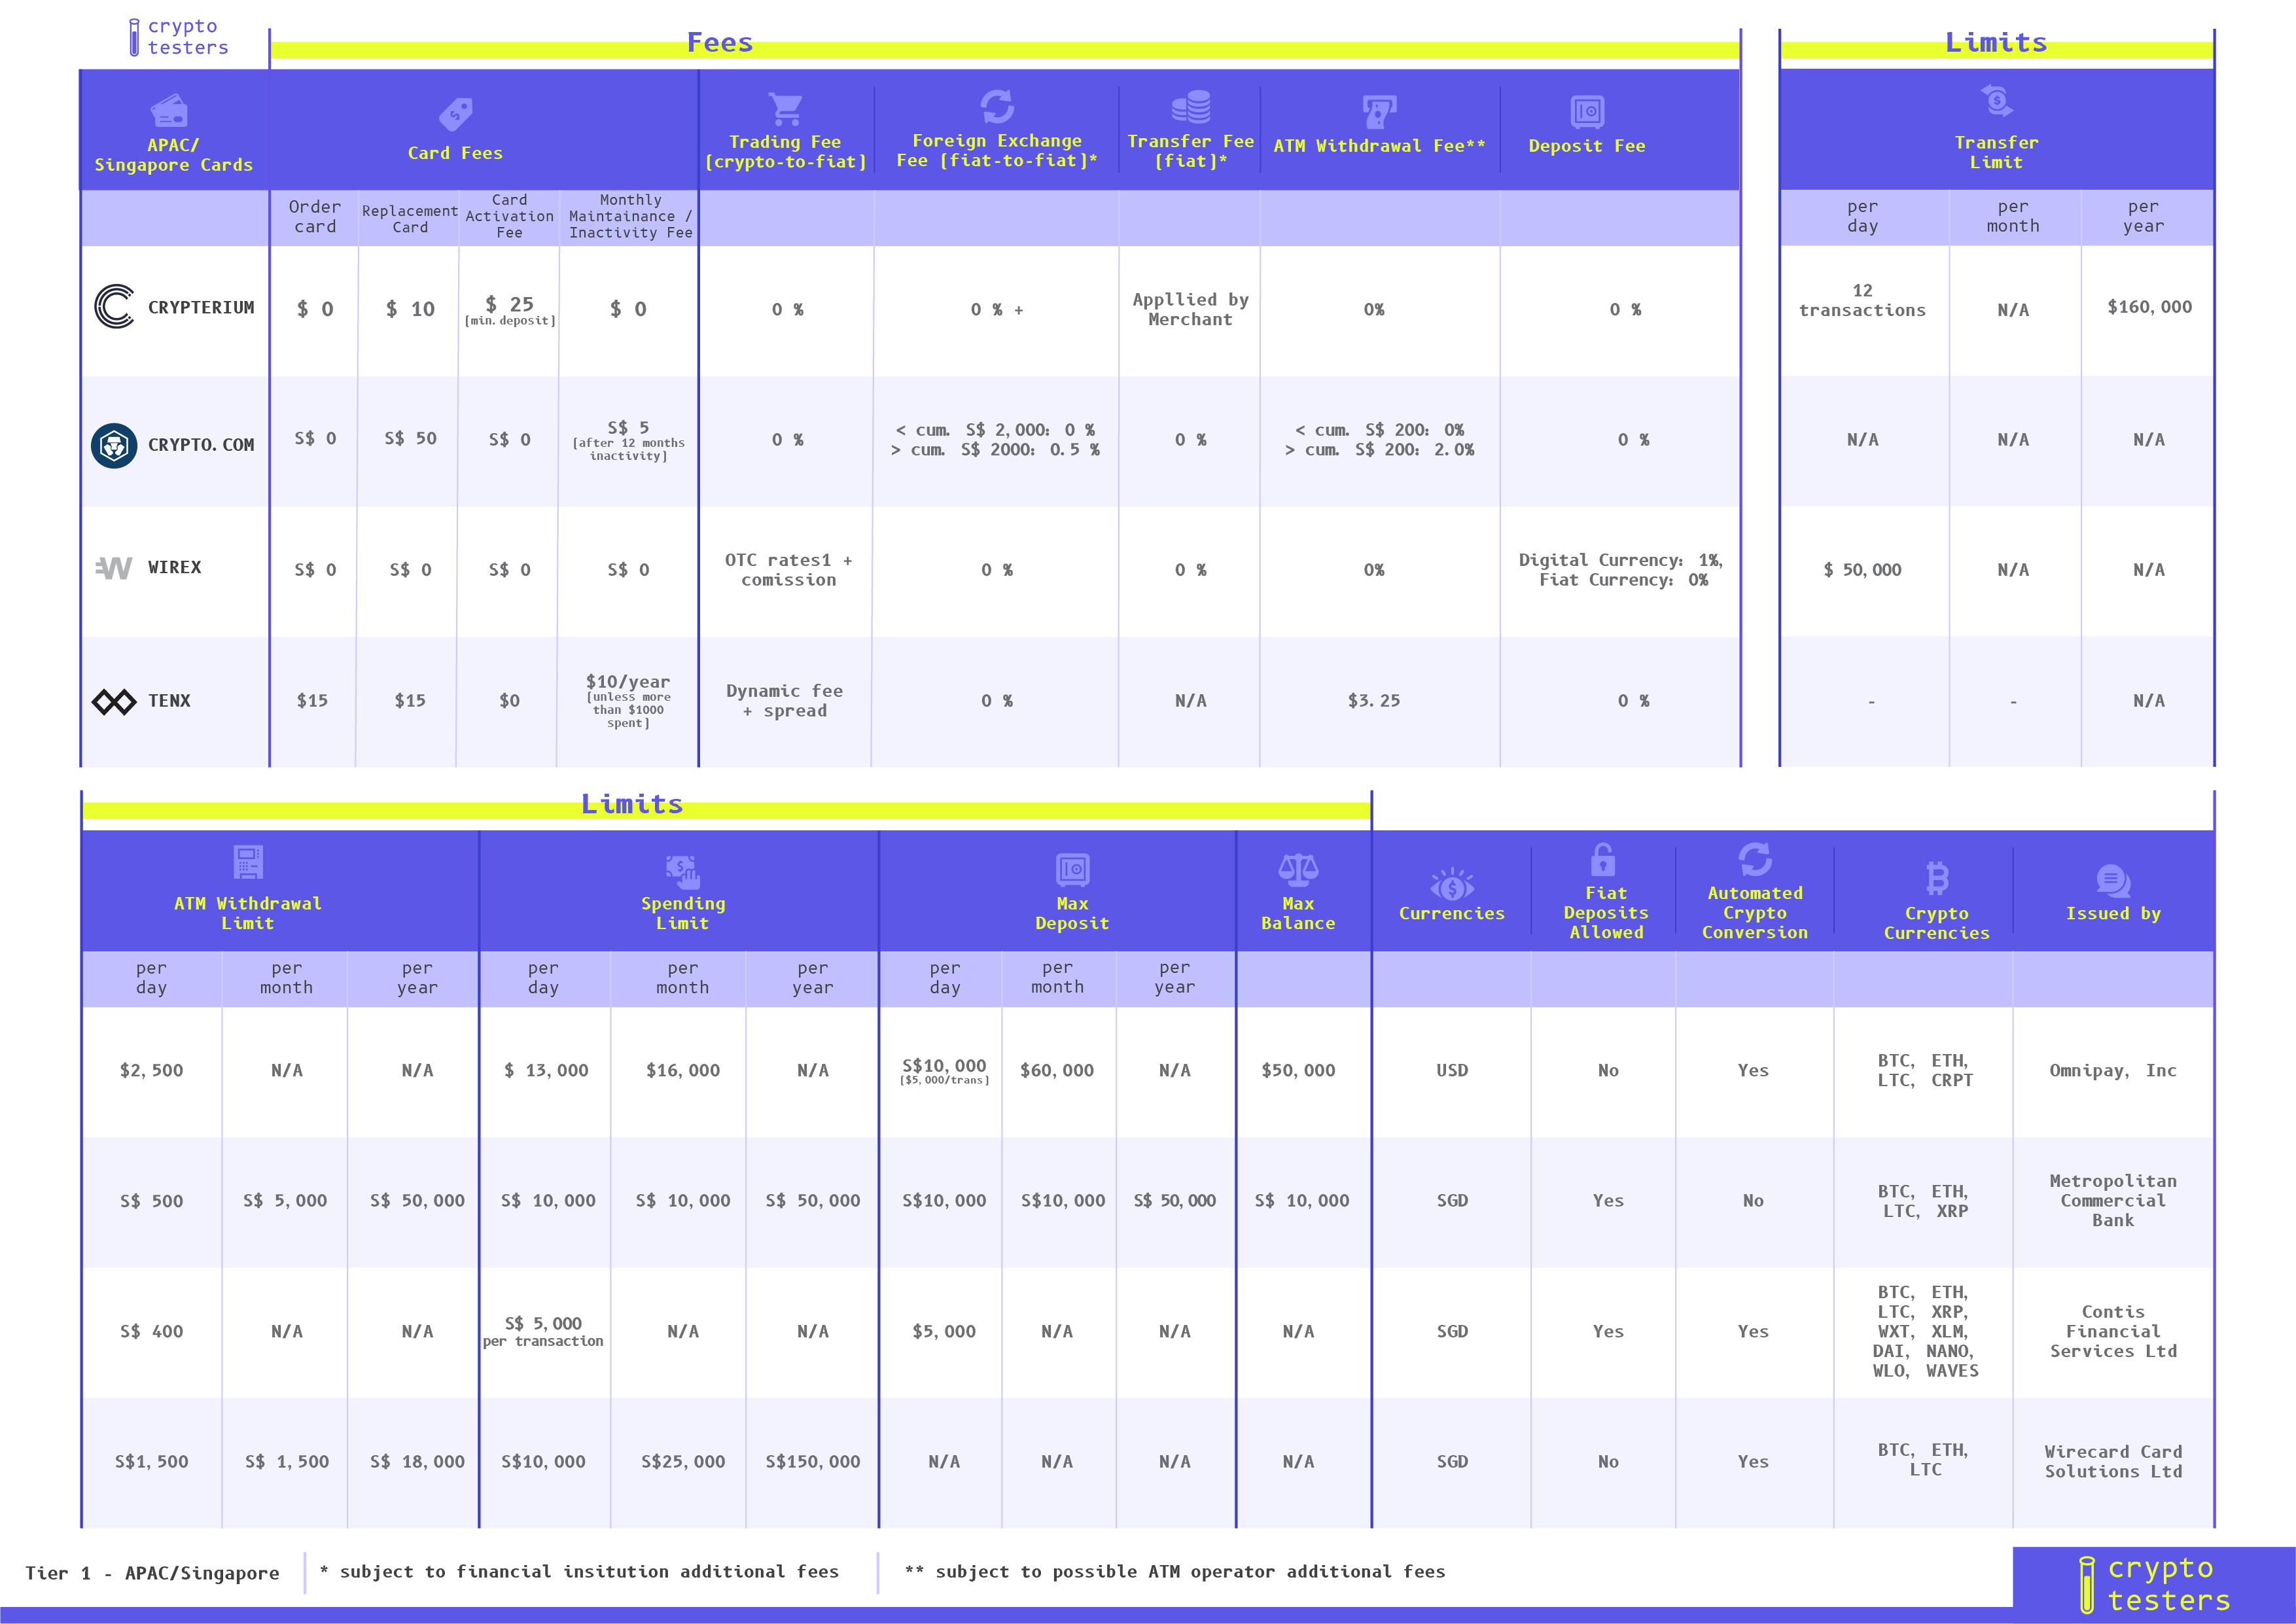 APAC singapore crypto cards comparison table